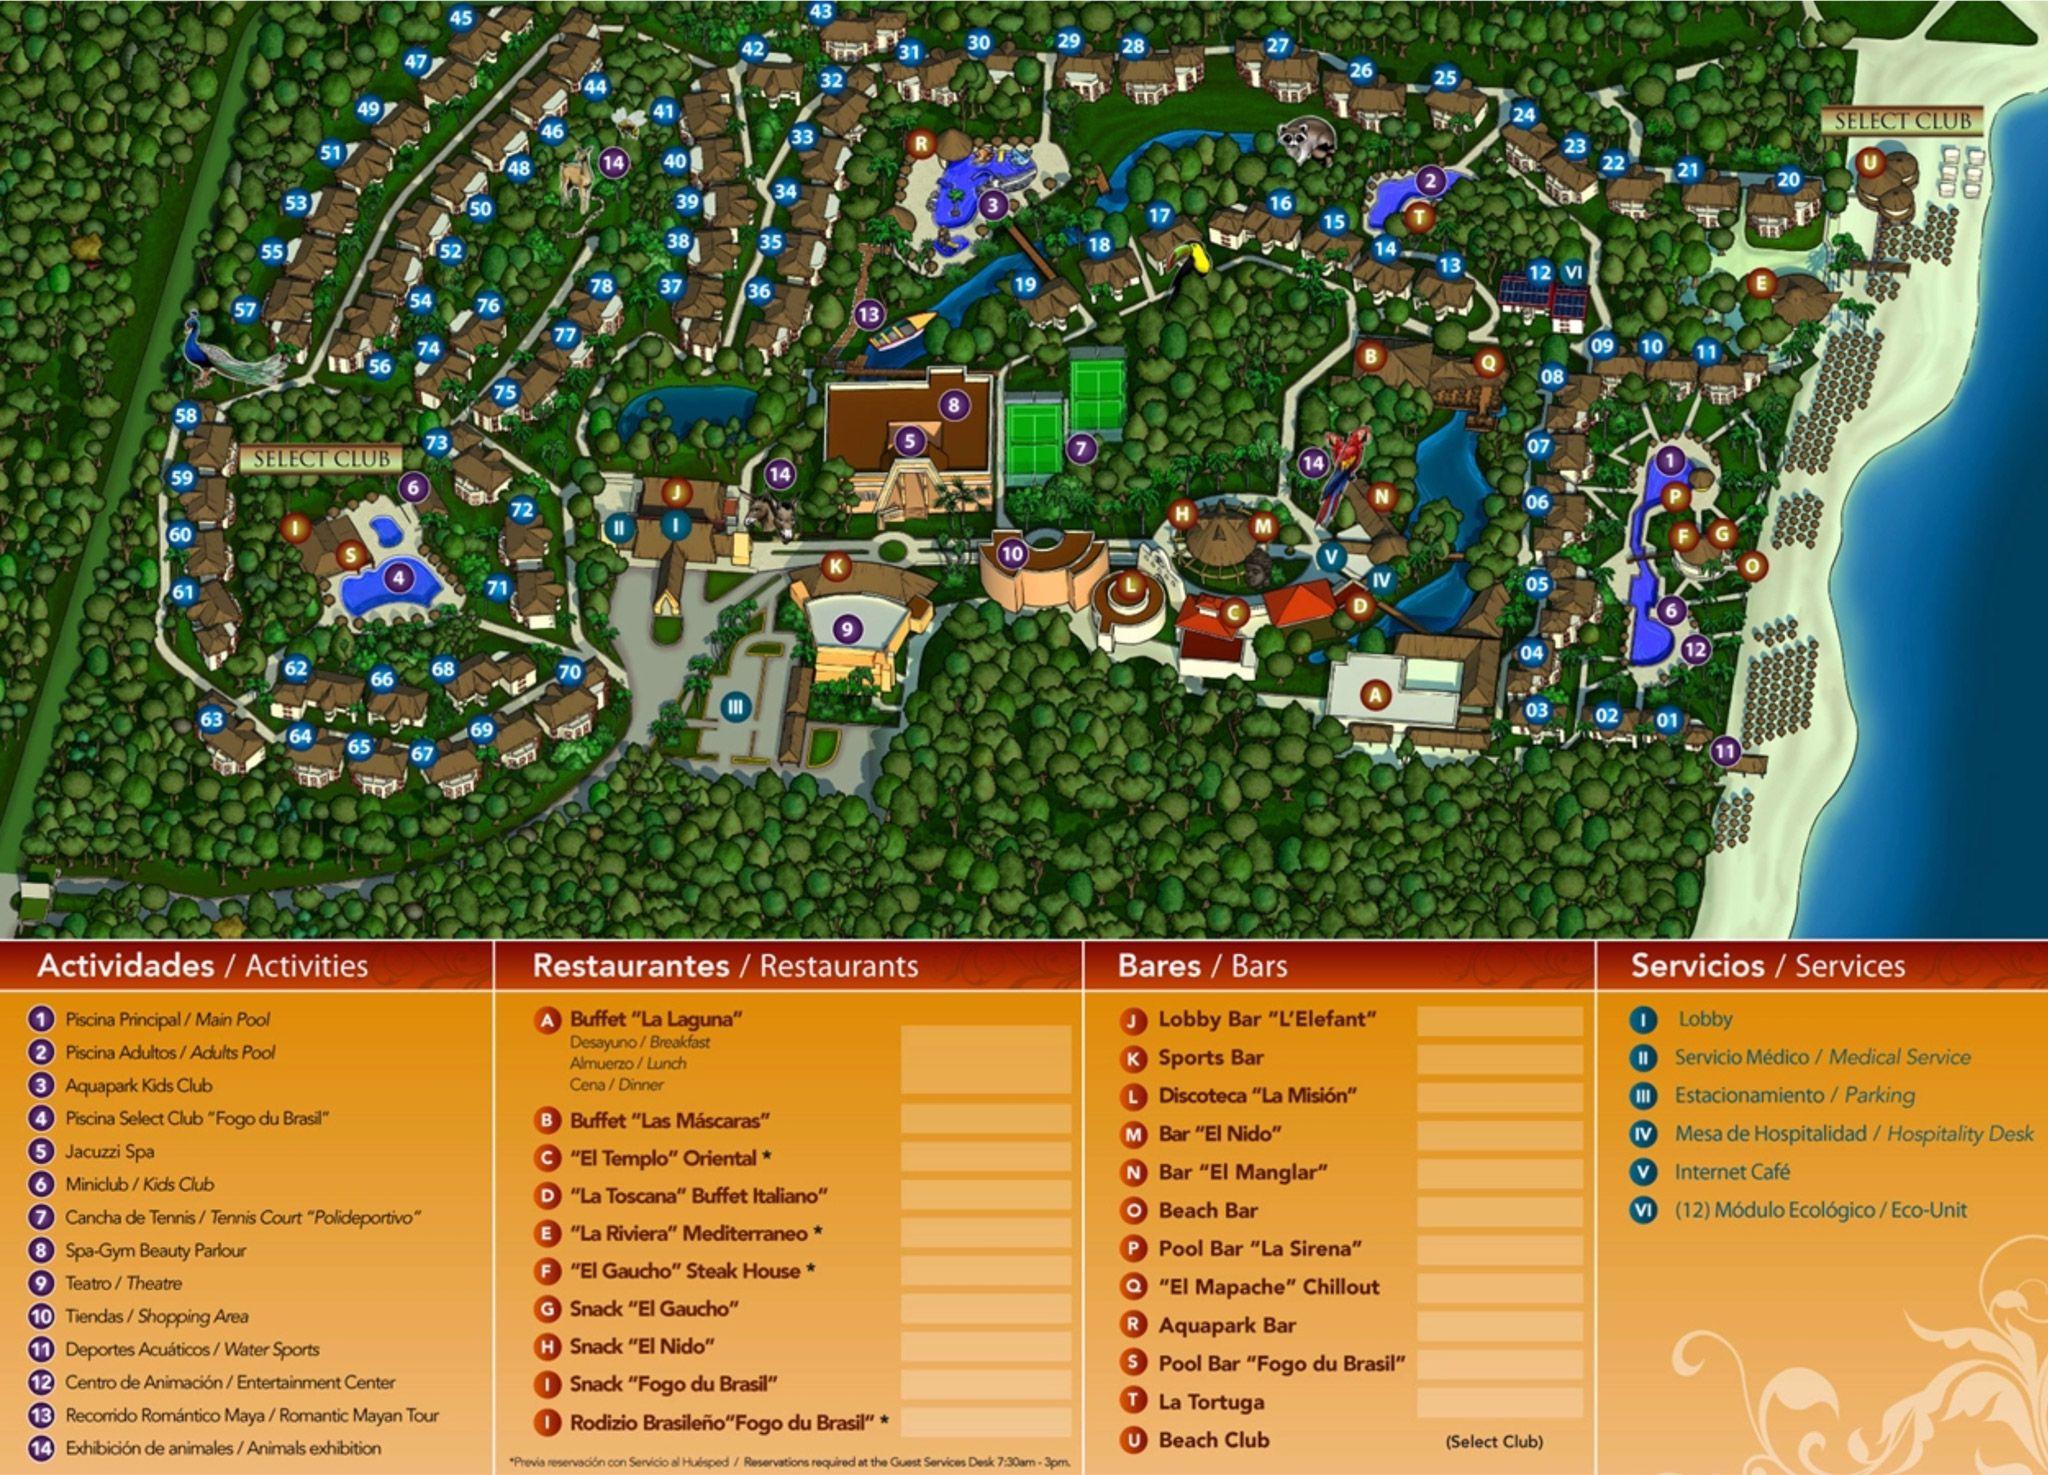 Sandos Caracol Eco Resort Map Image result for sandos caracol eco resort | Cancun Trip | Resort  Sandos Caracol Eco Resort Map